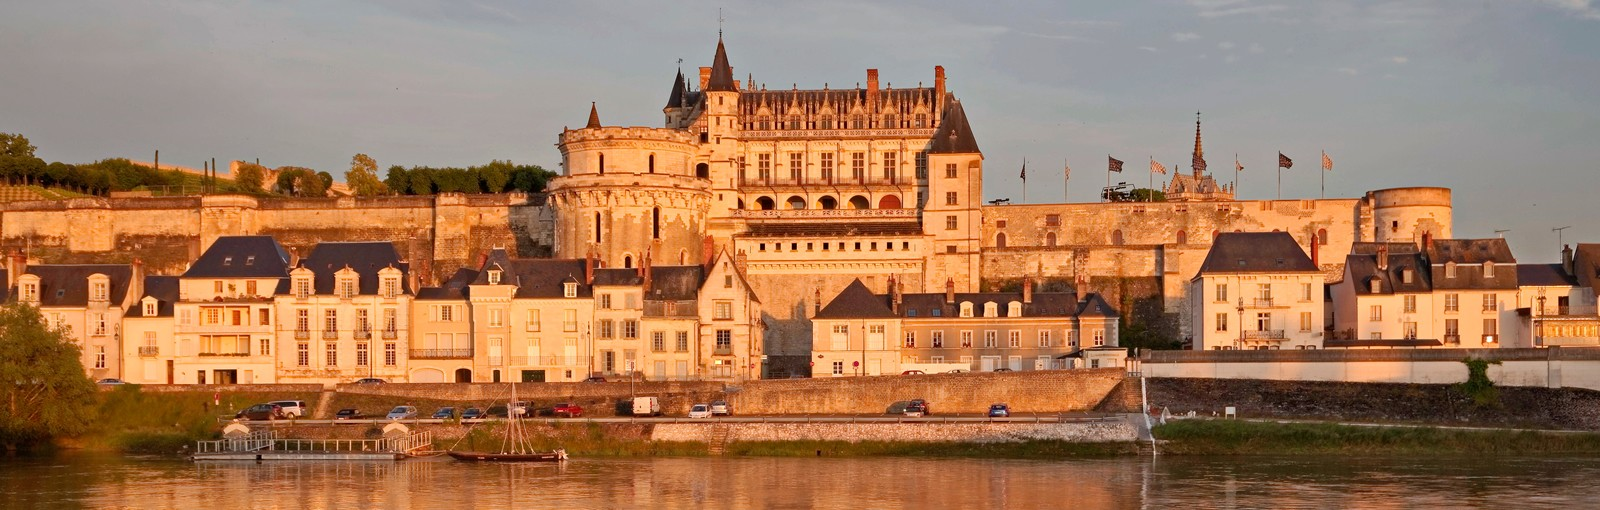 Tours 卢瓦尔河城堡-诺曼底 - 法国多个地区 - 从巴黎出发的多日游